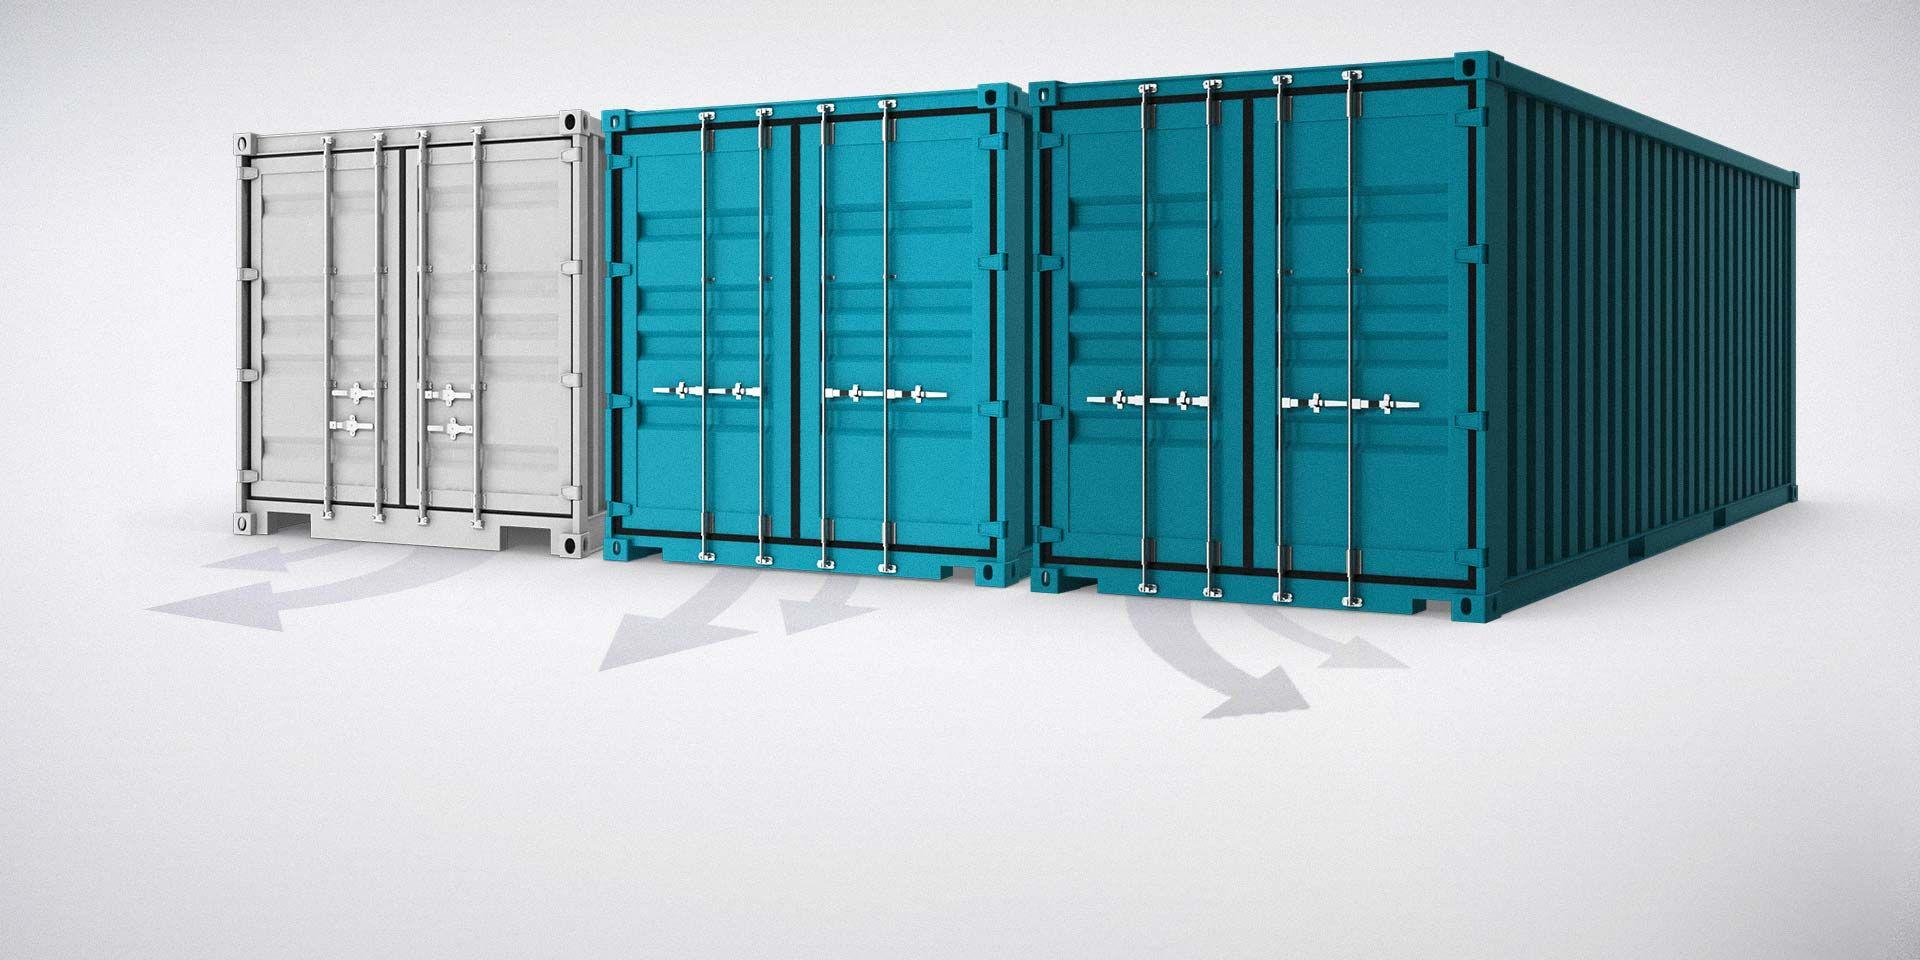 Individuelle Ausgabeformate - Output Container